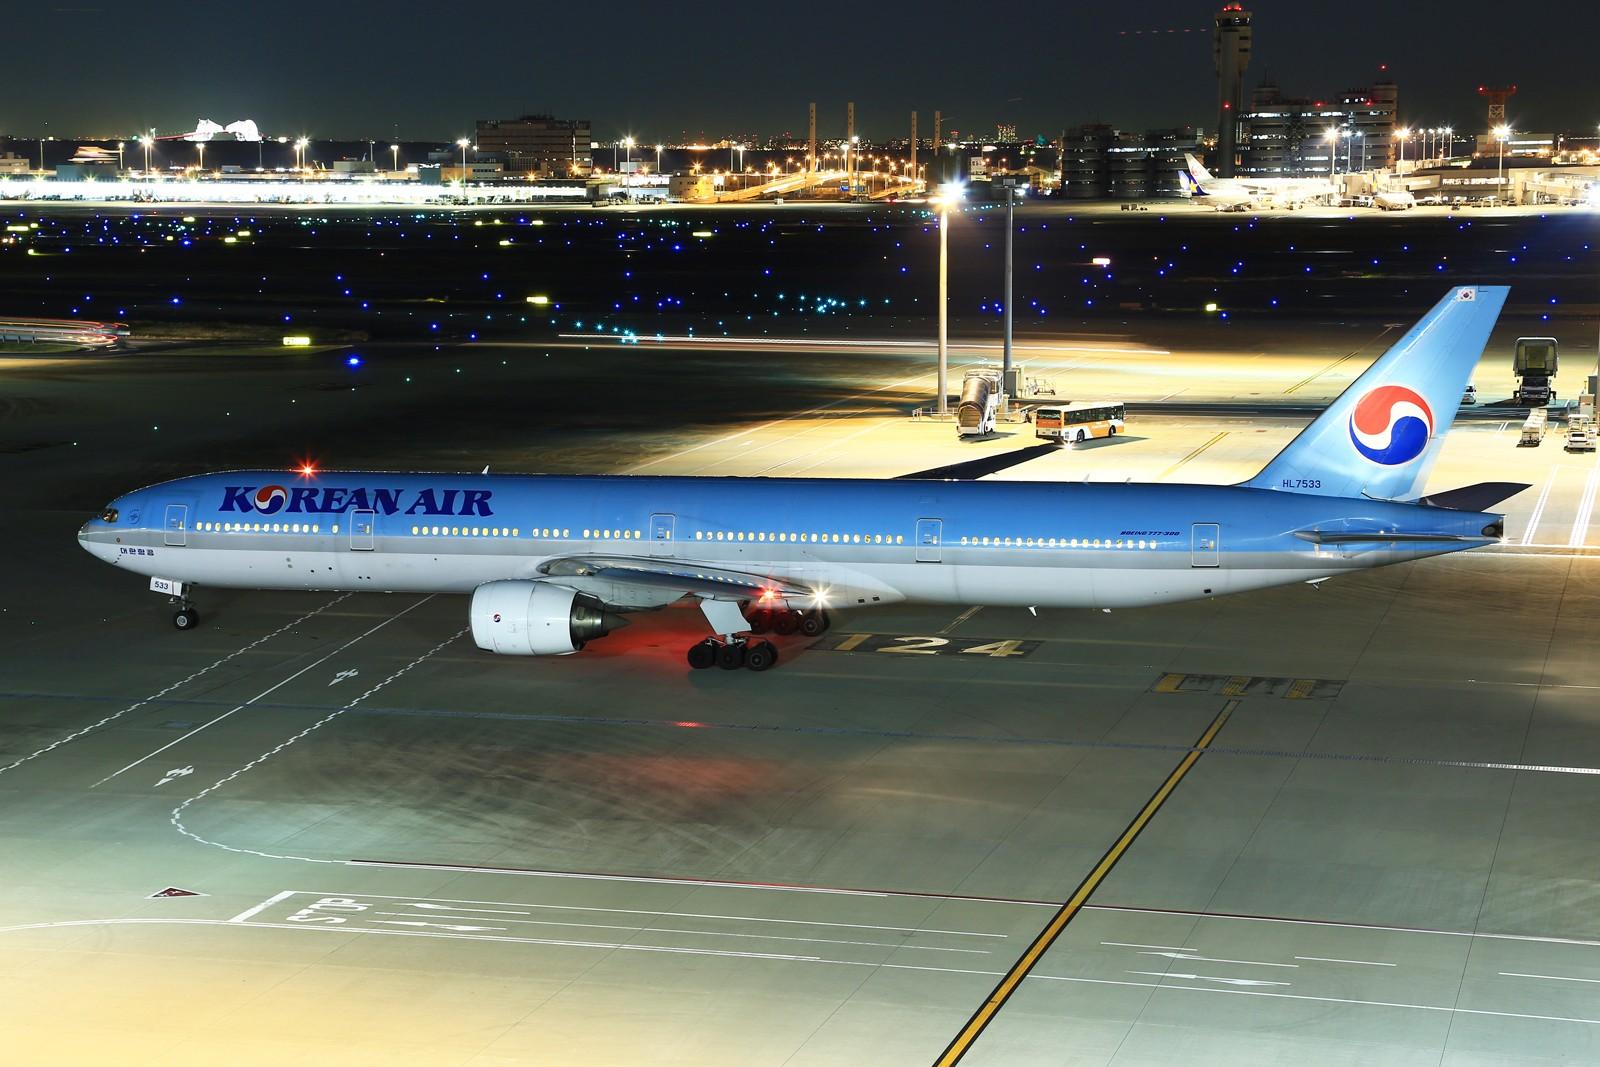 Re:[原创]【HND】******2016新年好,流窜羽田机场:全日空星战,汉莎1500th,以及一些大路货****** BOEING 777-300 HL7533 日本东京羽田国际机场